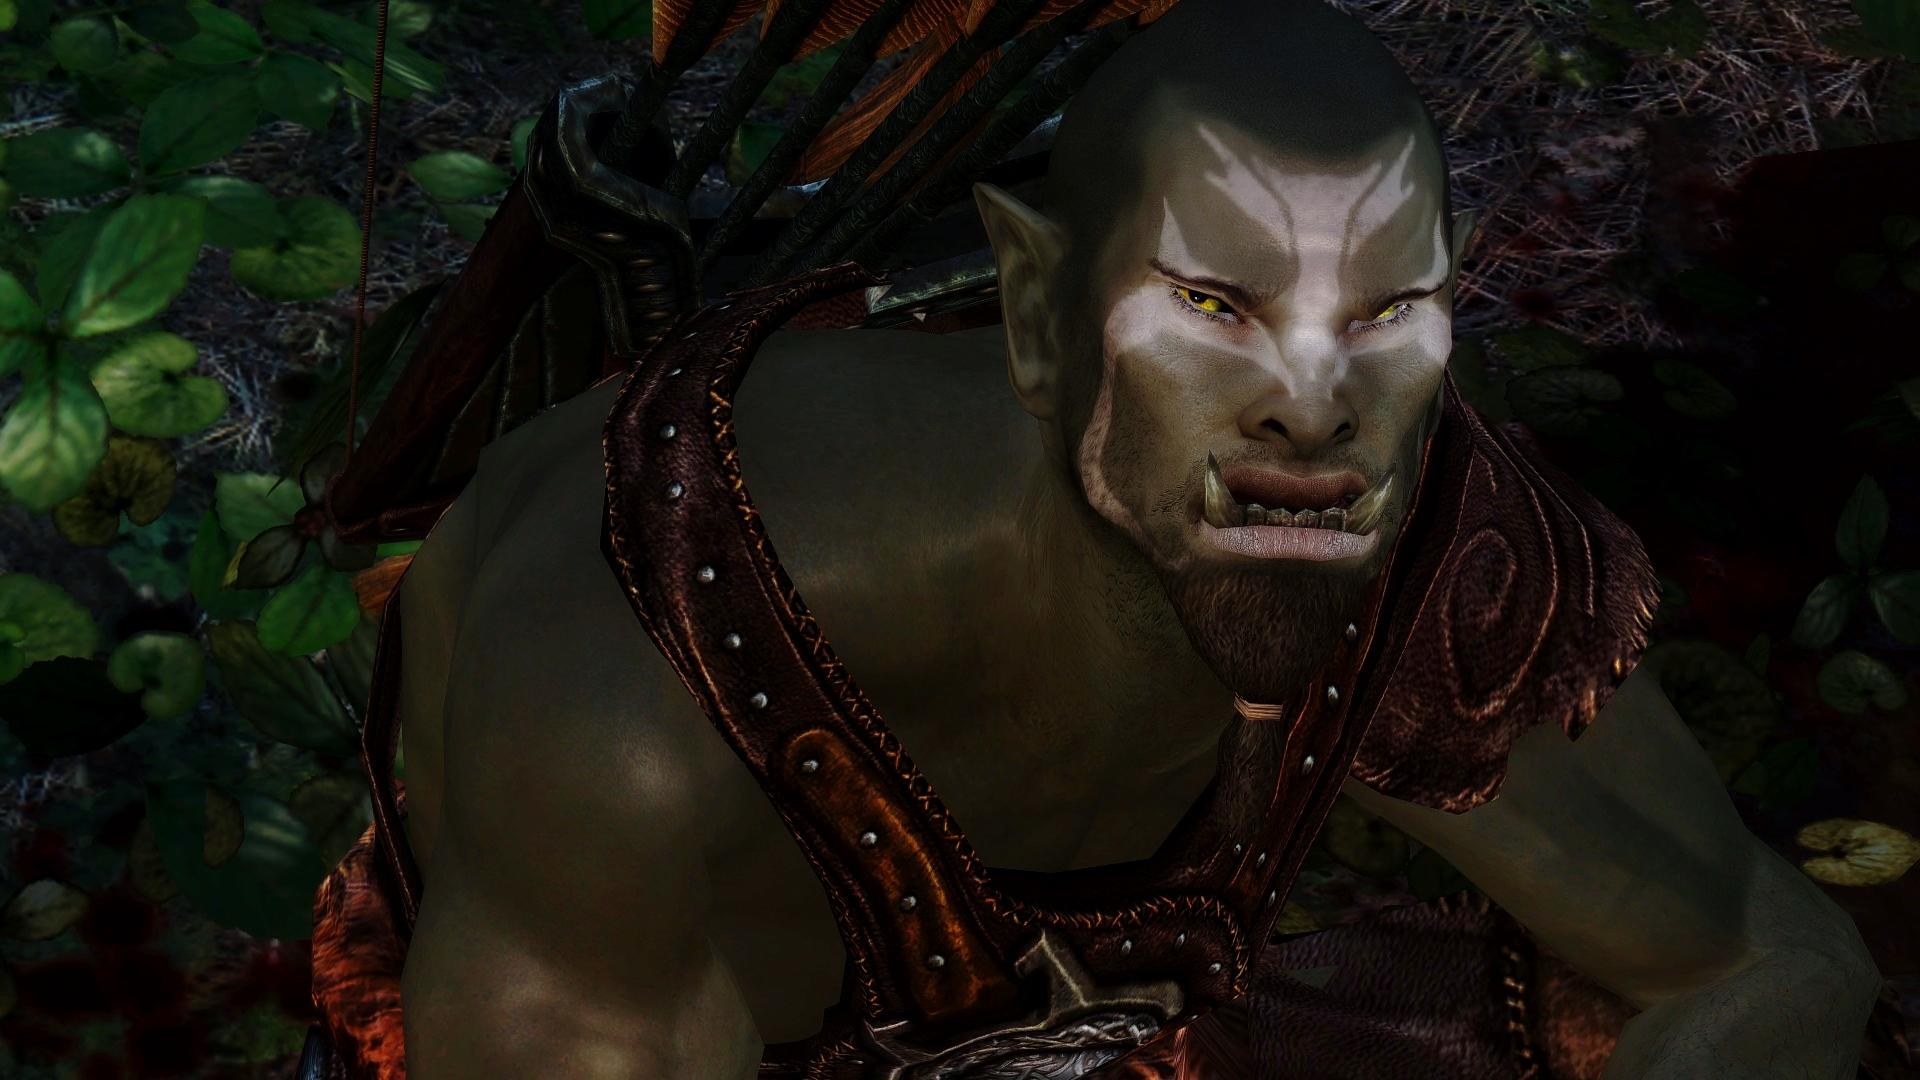 Brakh   The Elder Scrolls Mods Wiki   FANDOM powered by Wikia